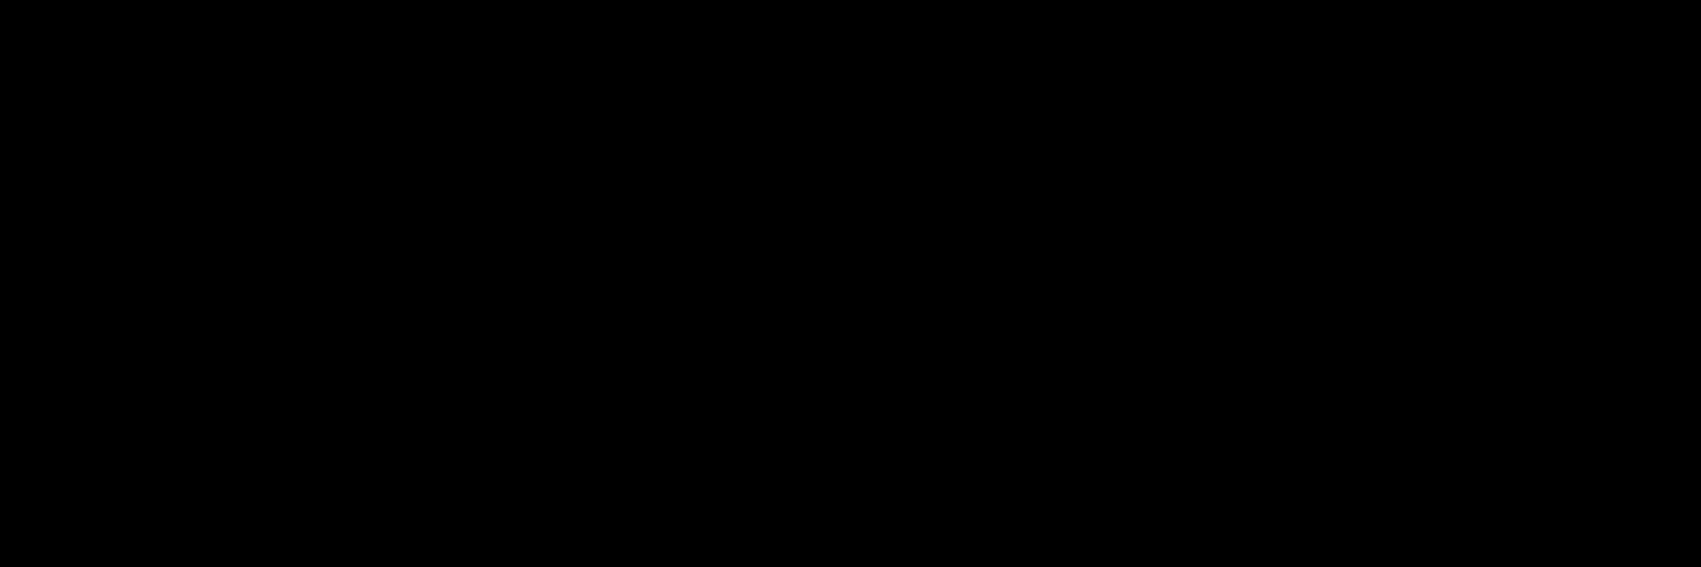 logo for Vision Centre Lynn Mall Optometrists